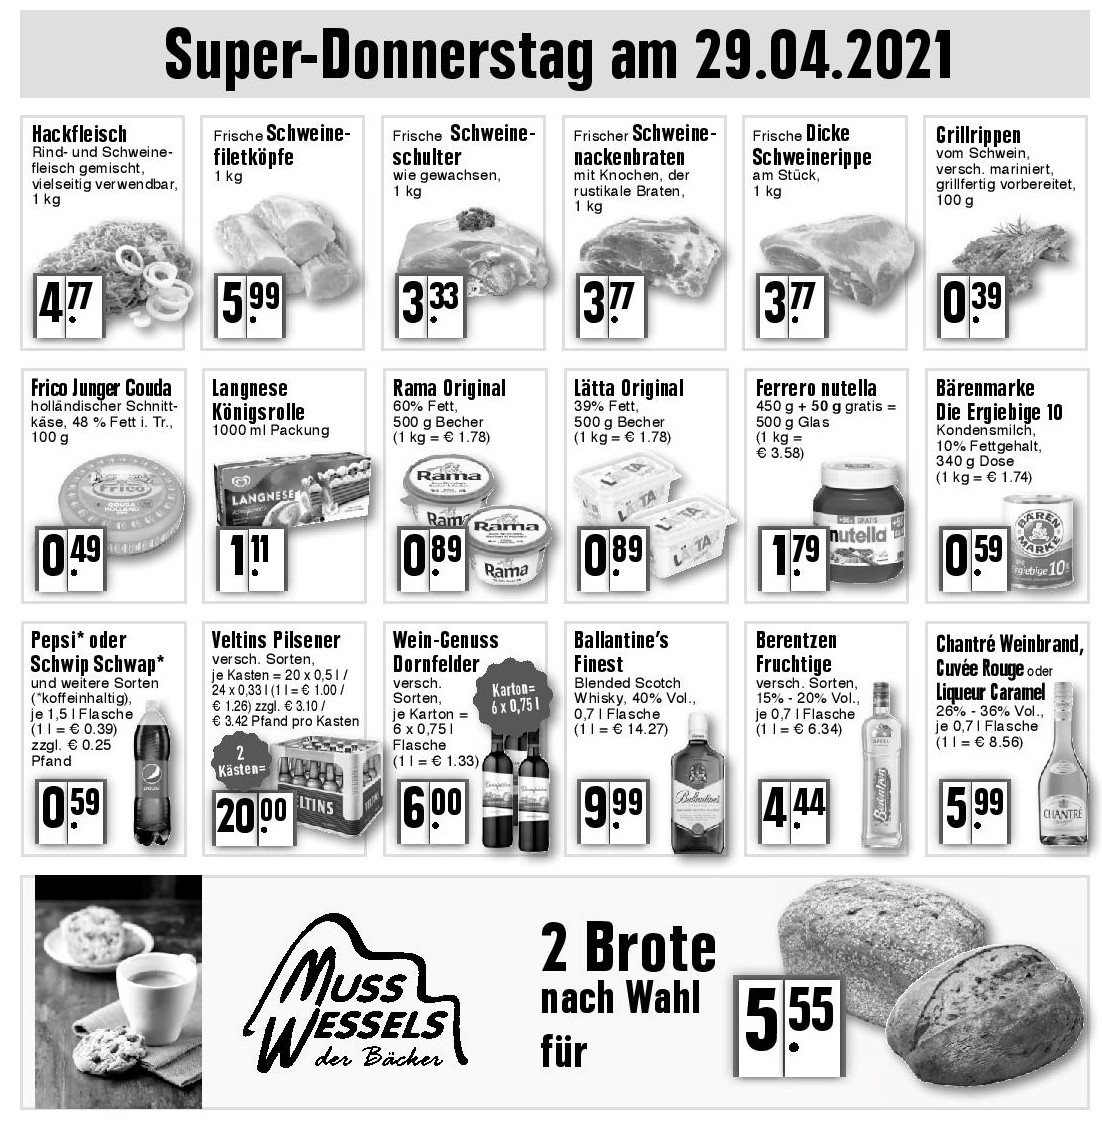 Super-Donnerstag am 29.04.2021